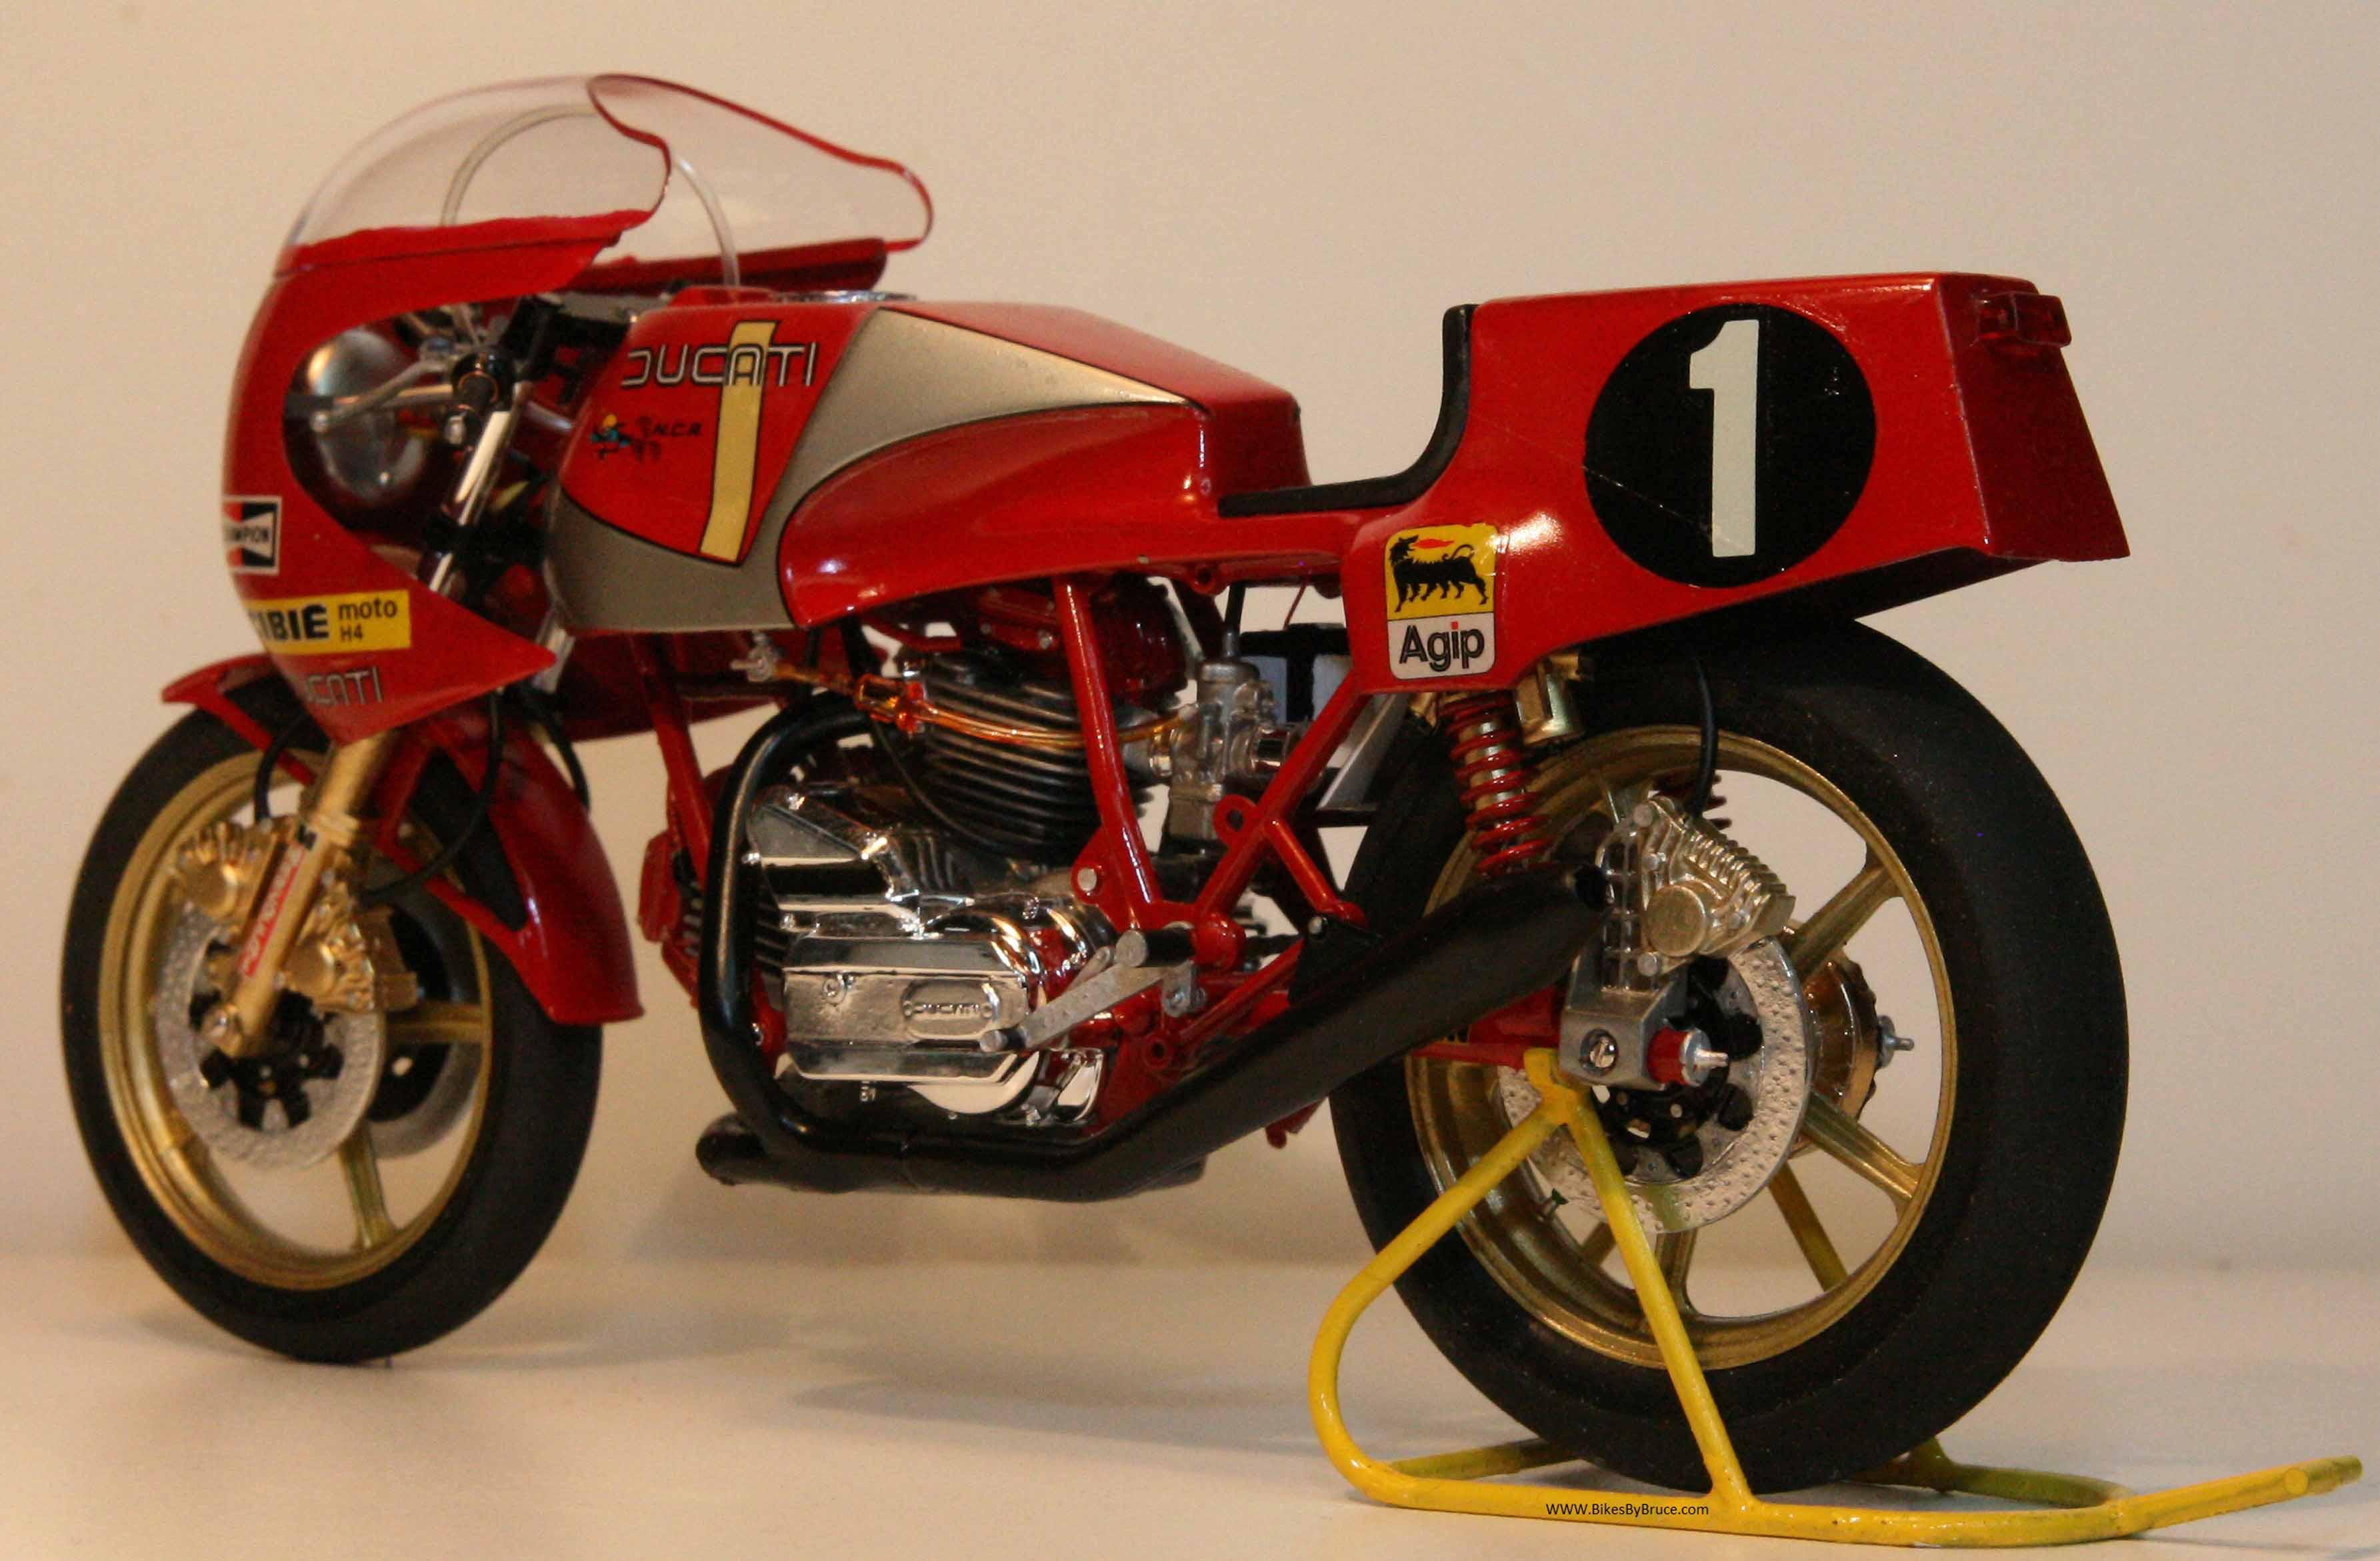 Bikes By Bruce - Ducati